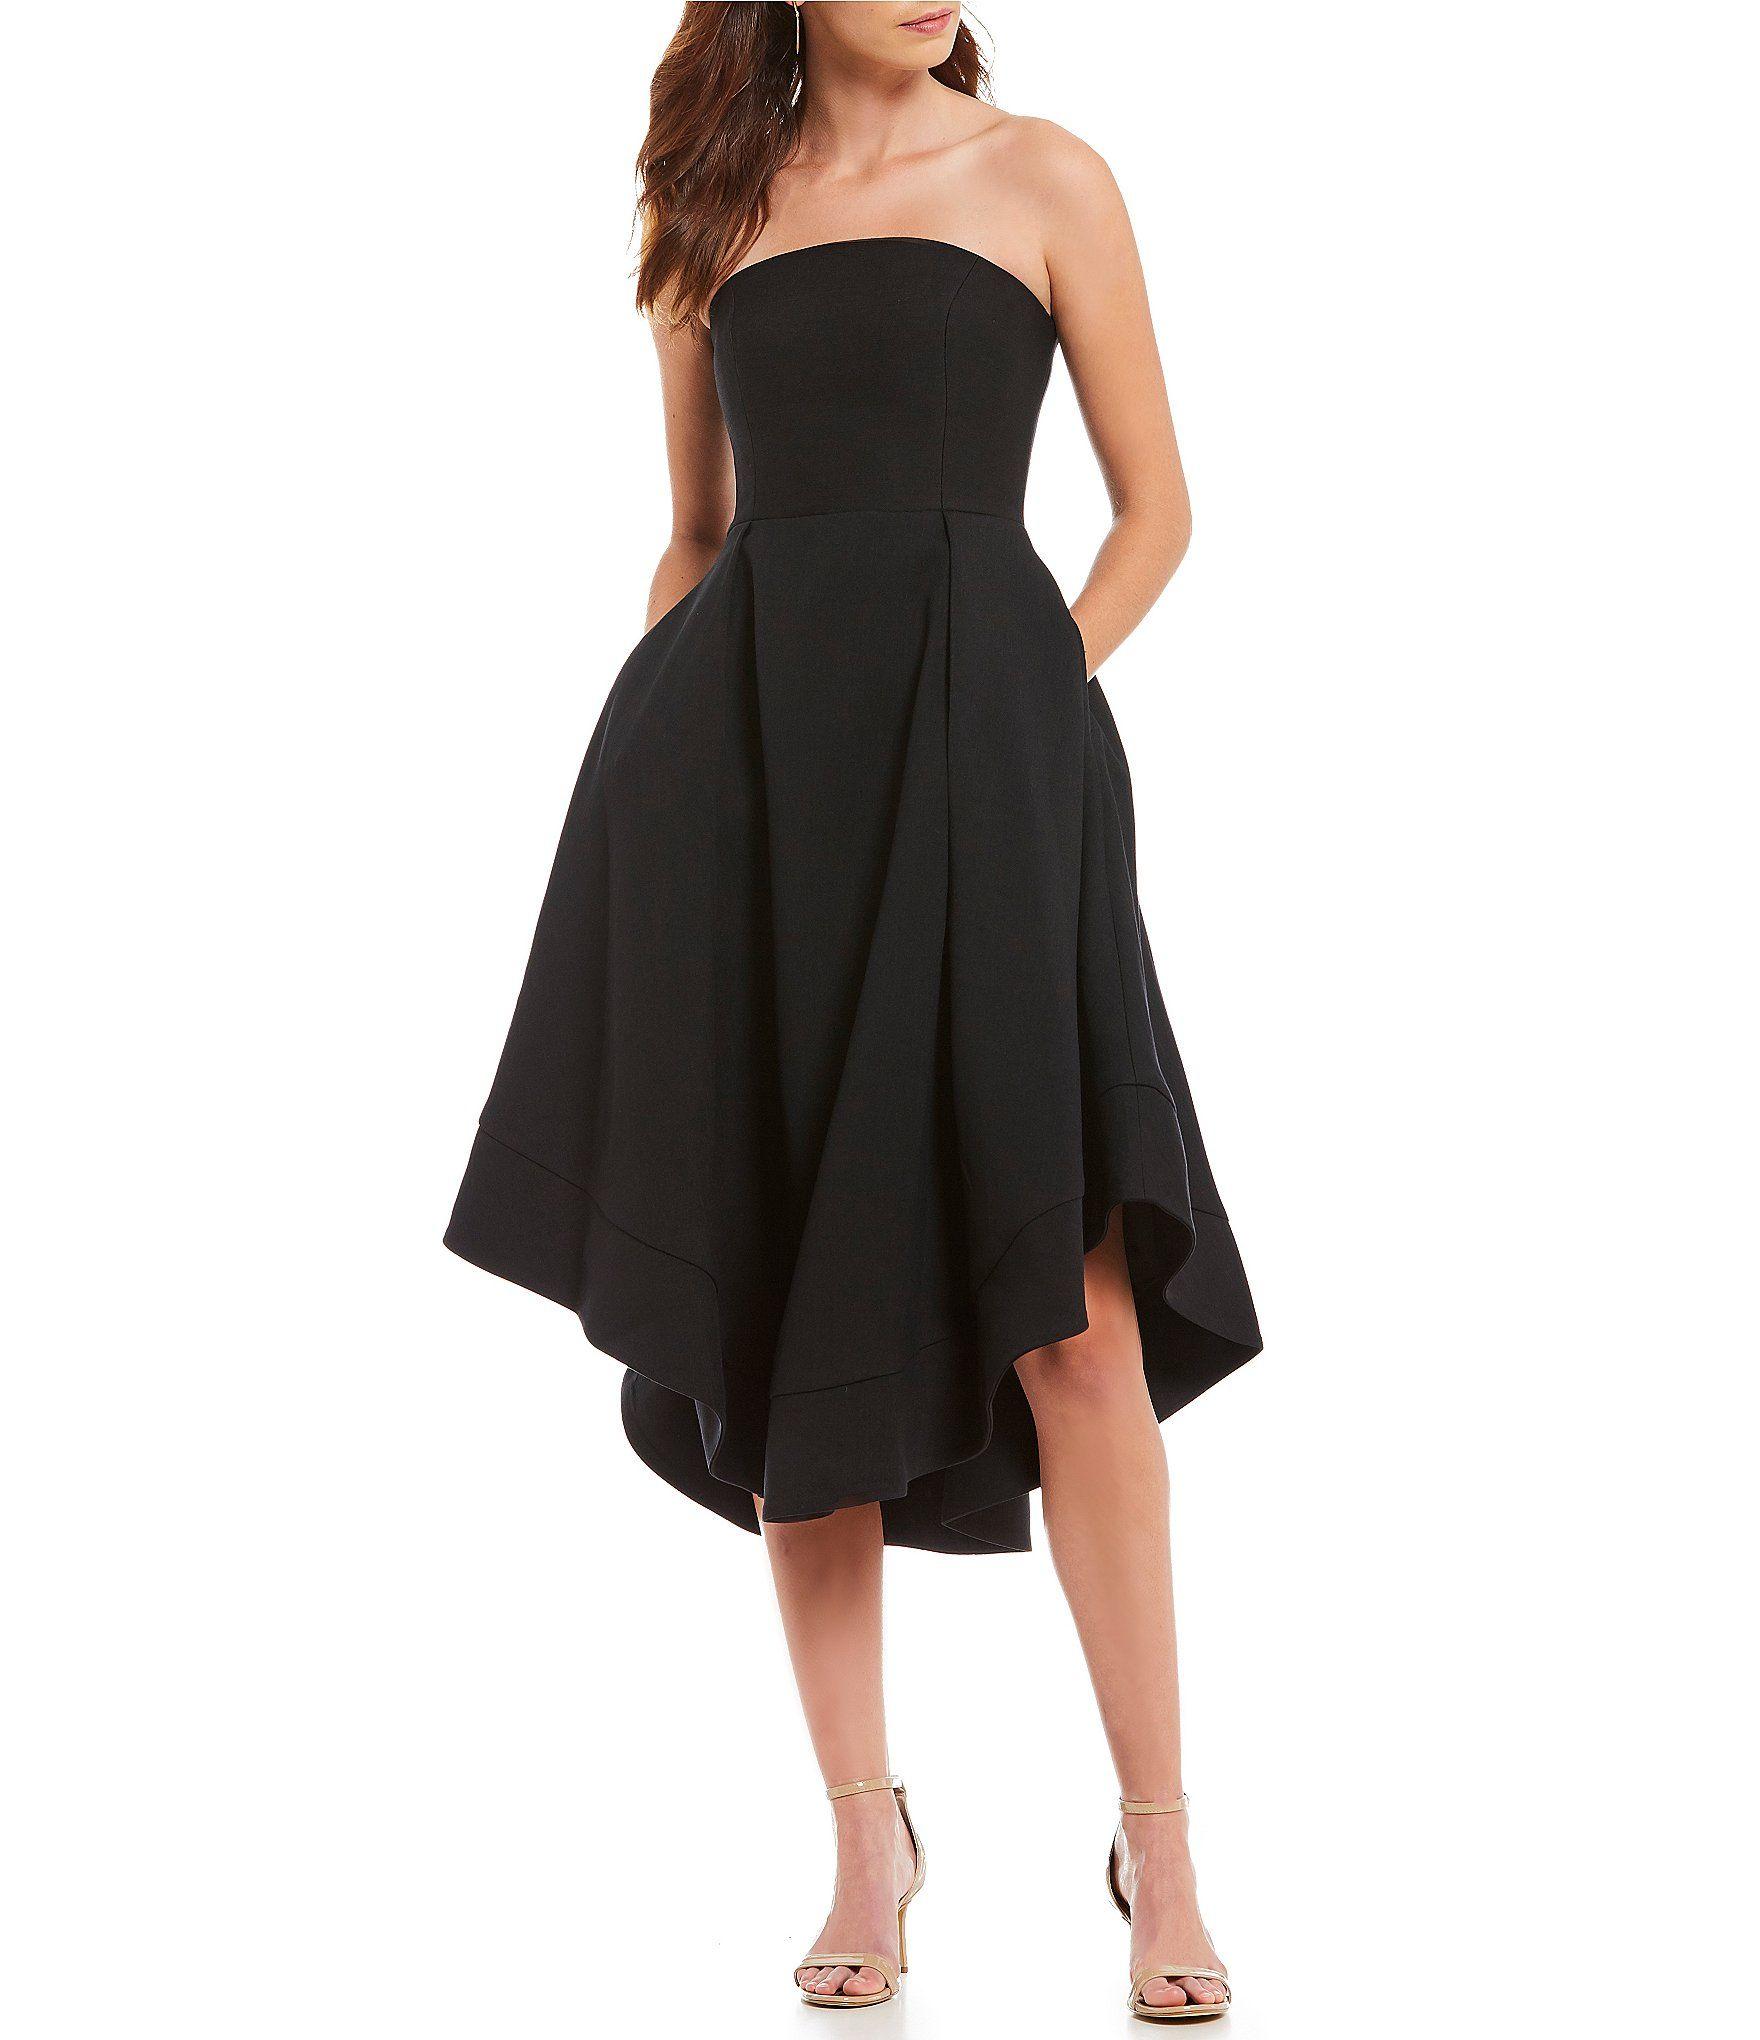 Pin By Bahar Bebe On Clothes Strapless Midi Dress Midi Dress Formal Banquet Dresses [ 2040 x 1760 Pixel ]